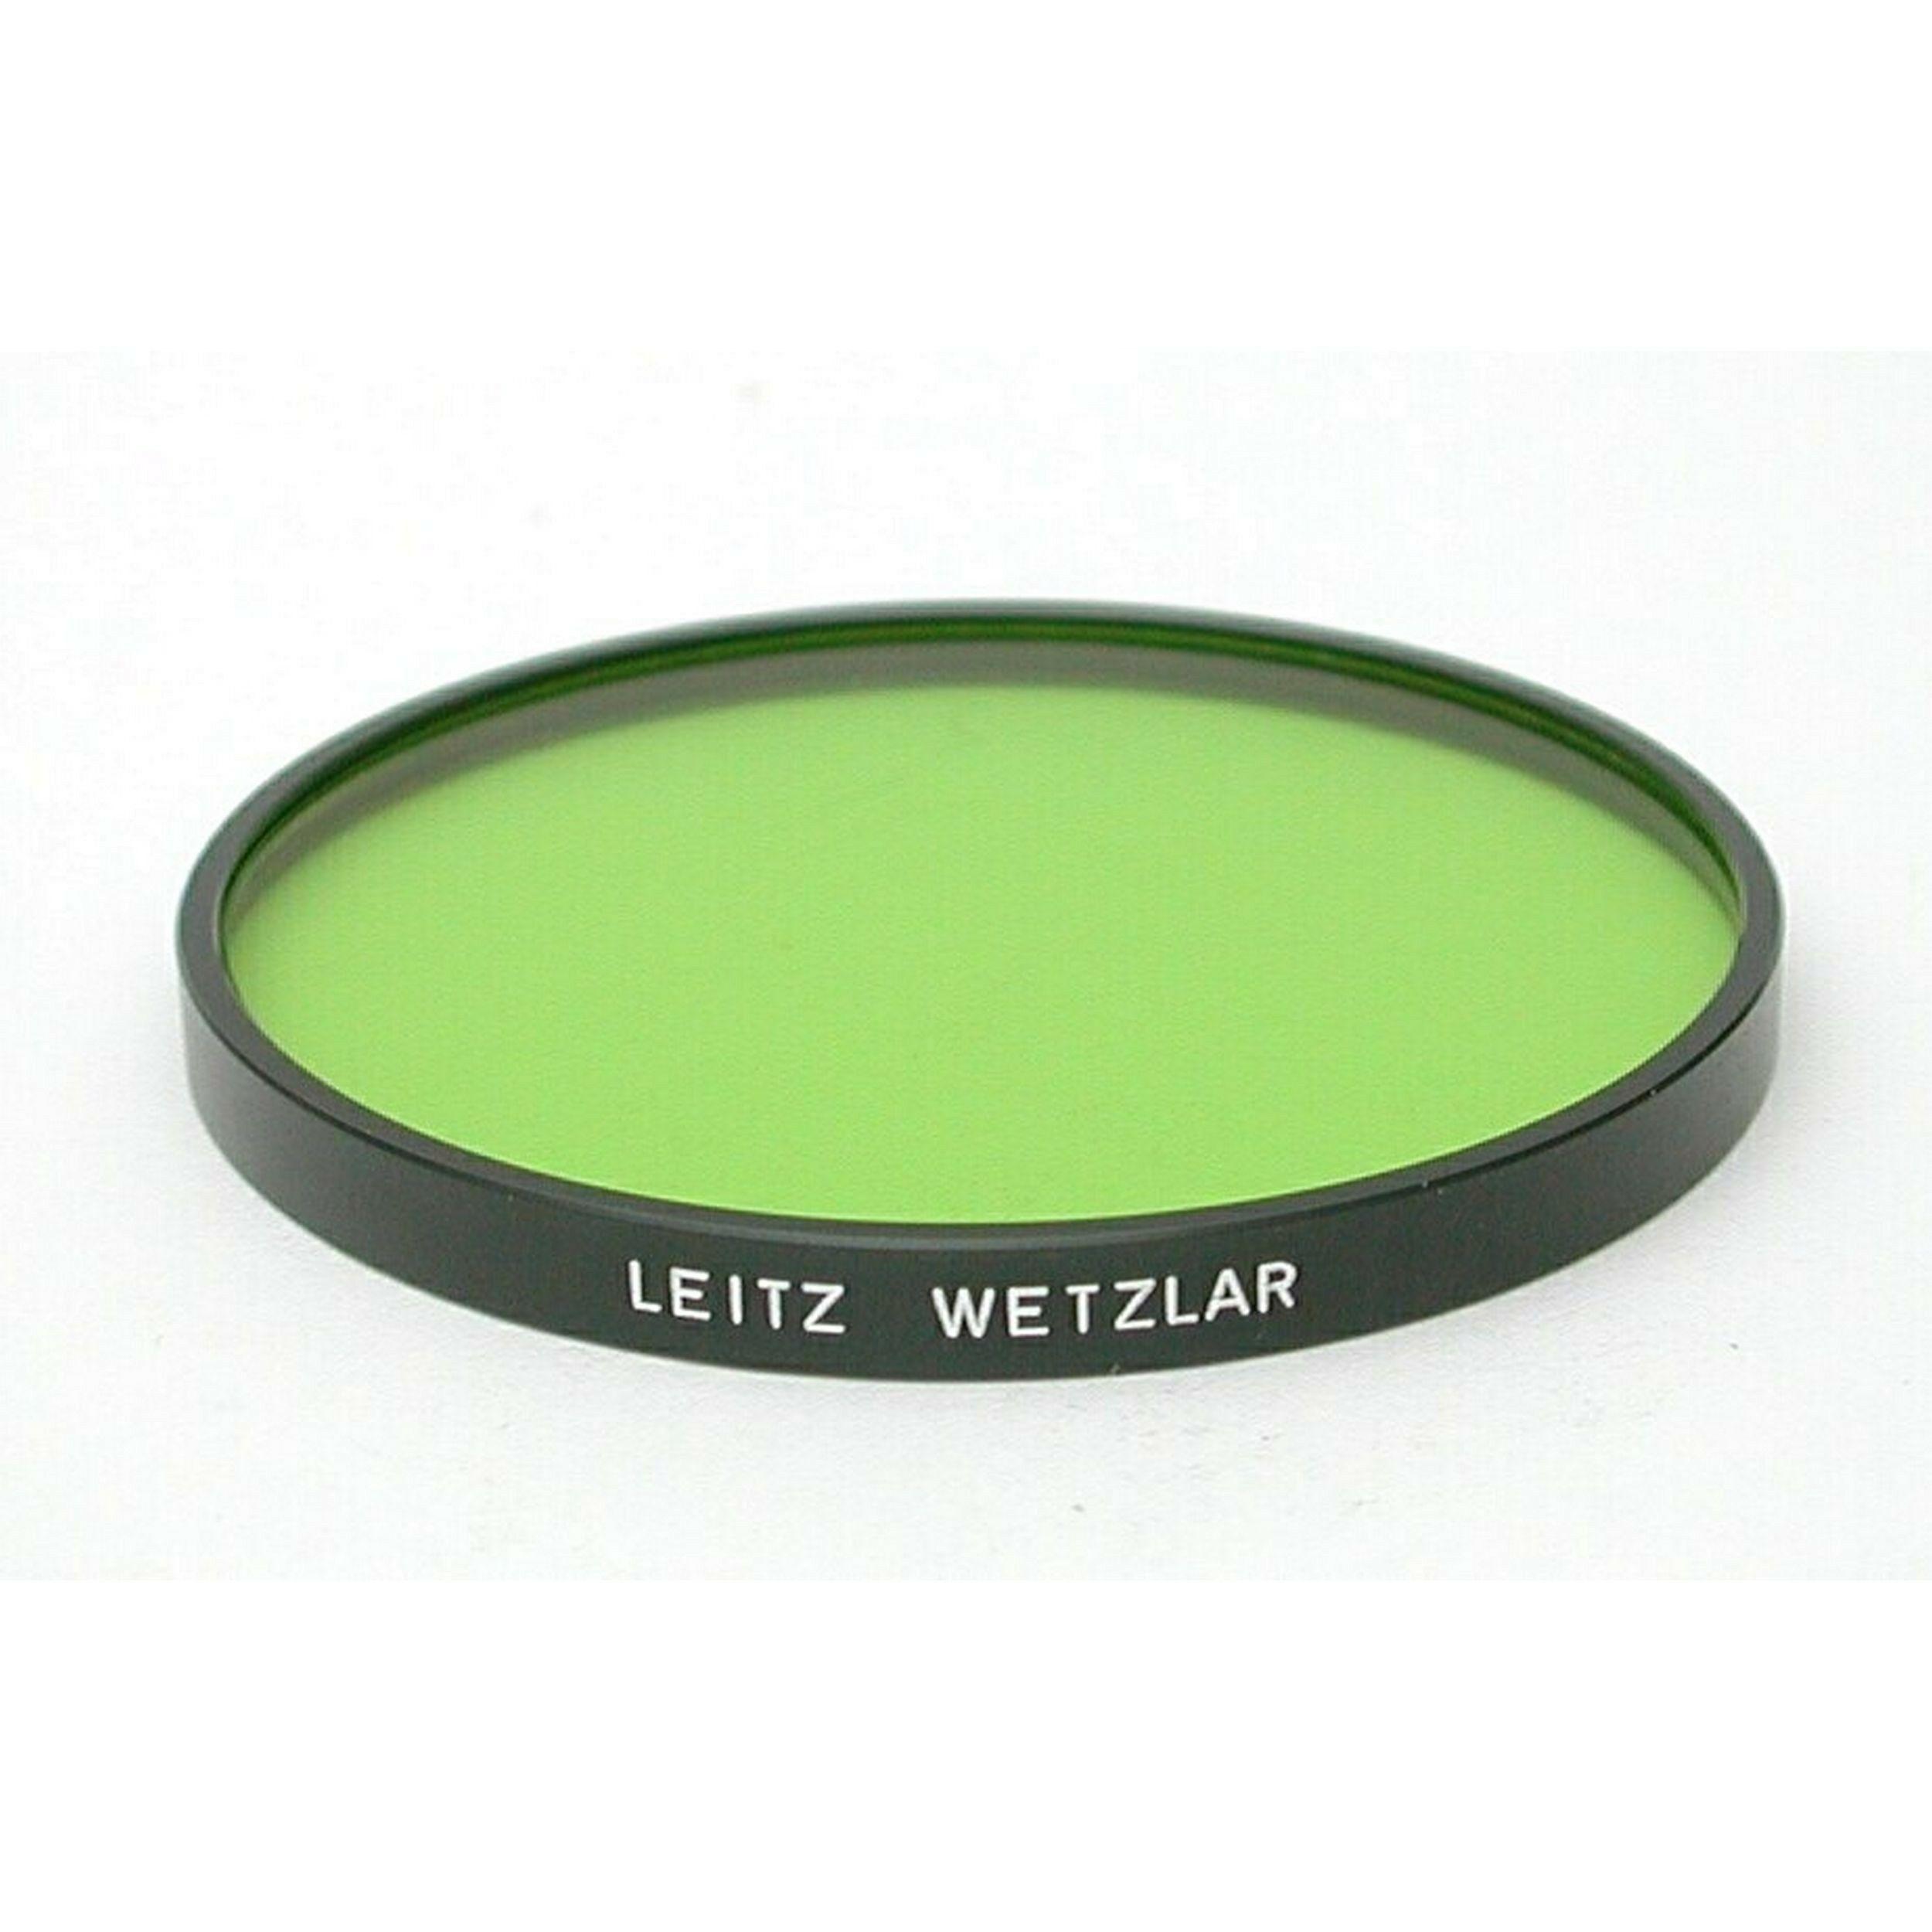 Leica series viii yellow green filter black box leica filters leica filters filter accessories leica accessories leica products